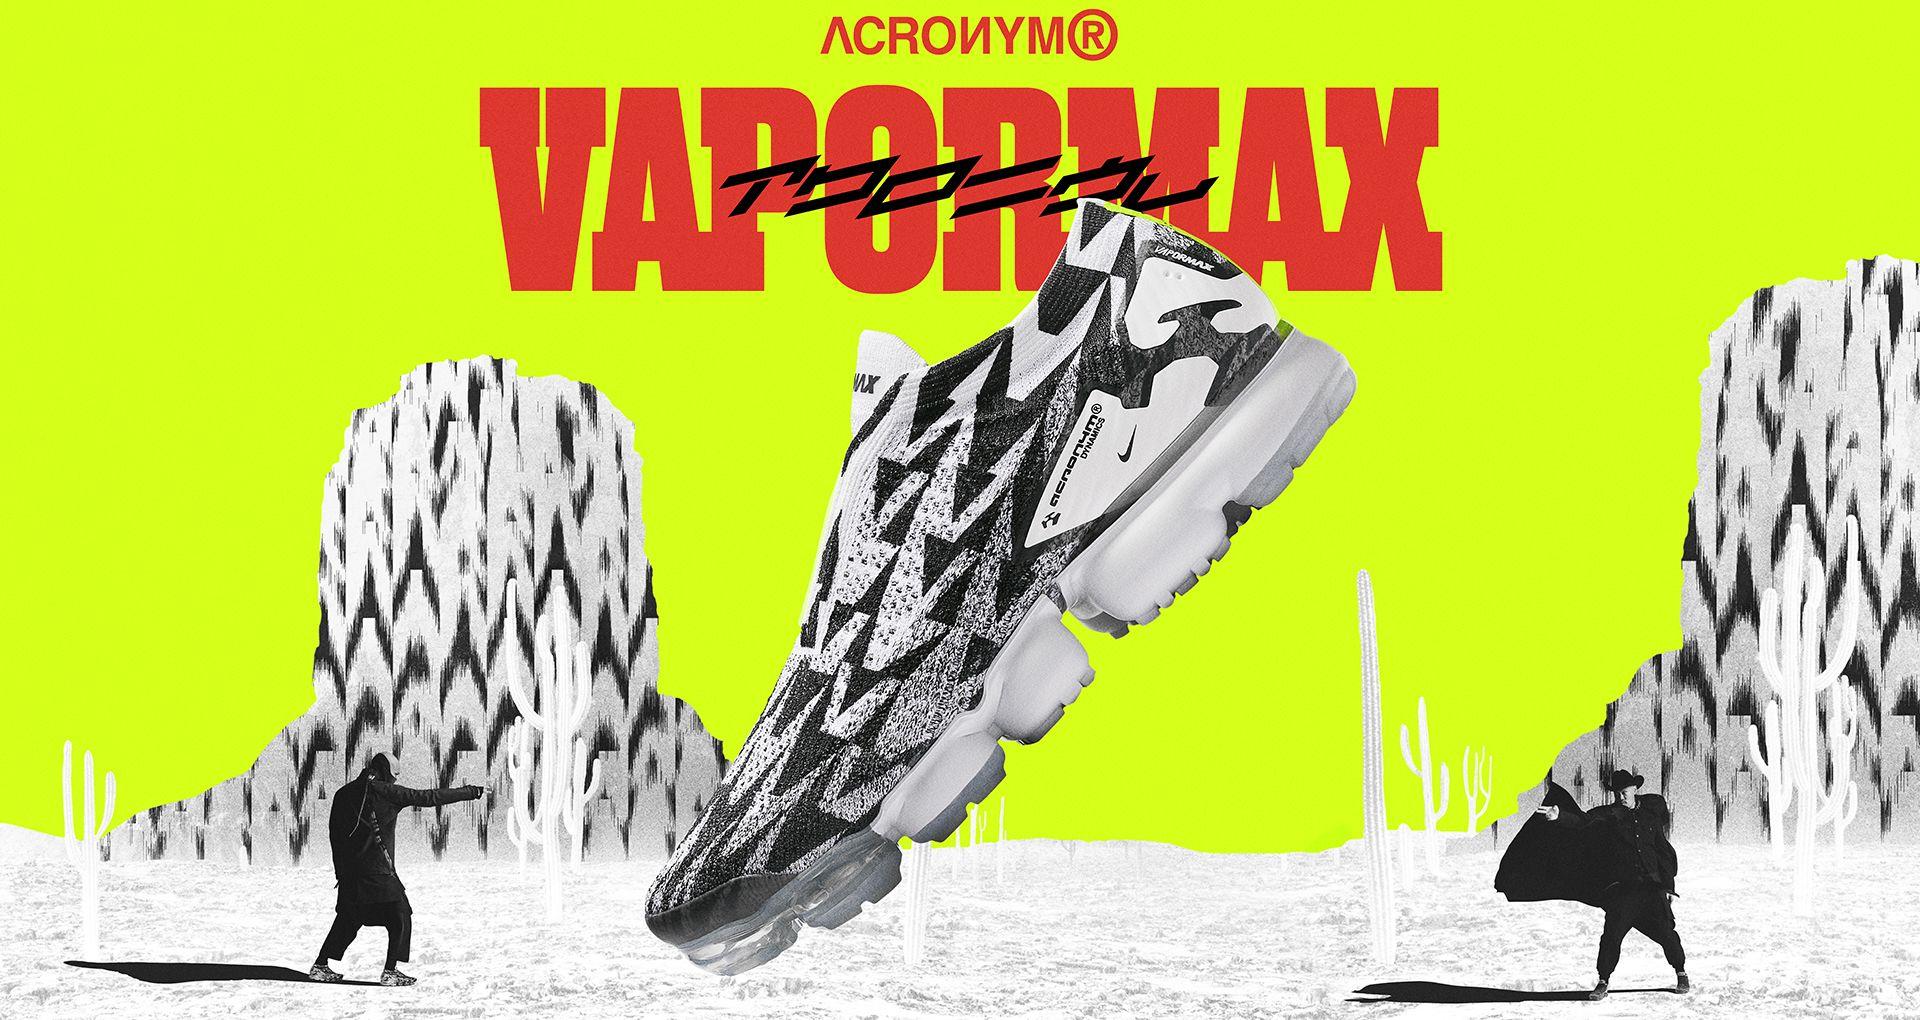 cf15496ad5659 Nike Air Vapormax Moc 2 Acronym  Light Bone   Black   Volt  Release ...